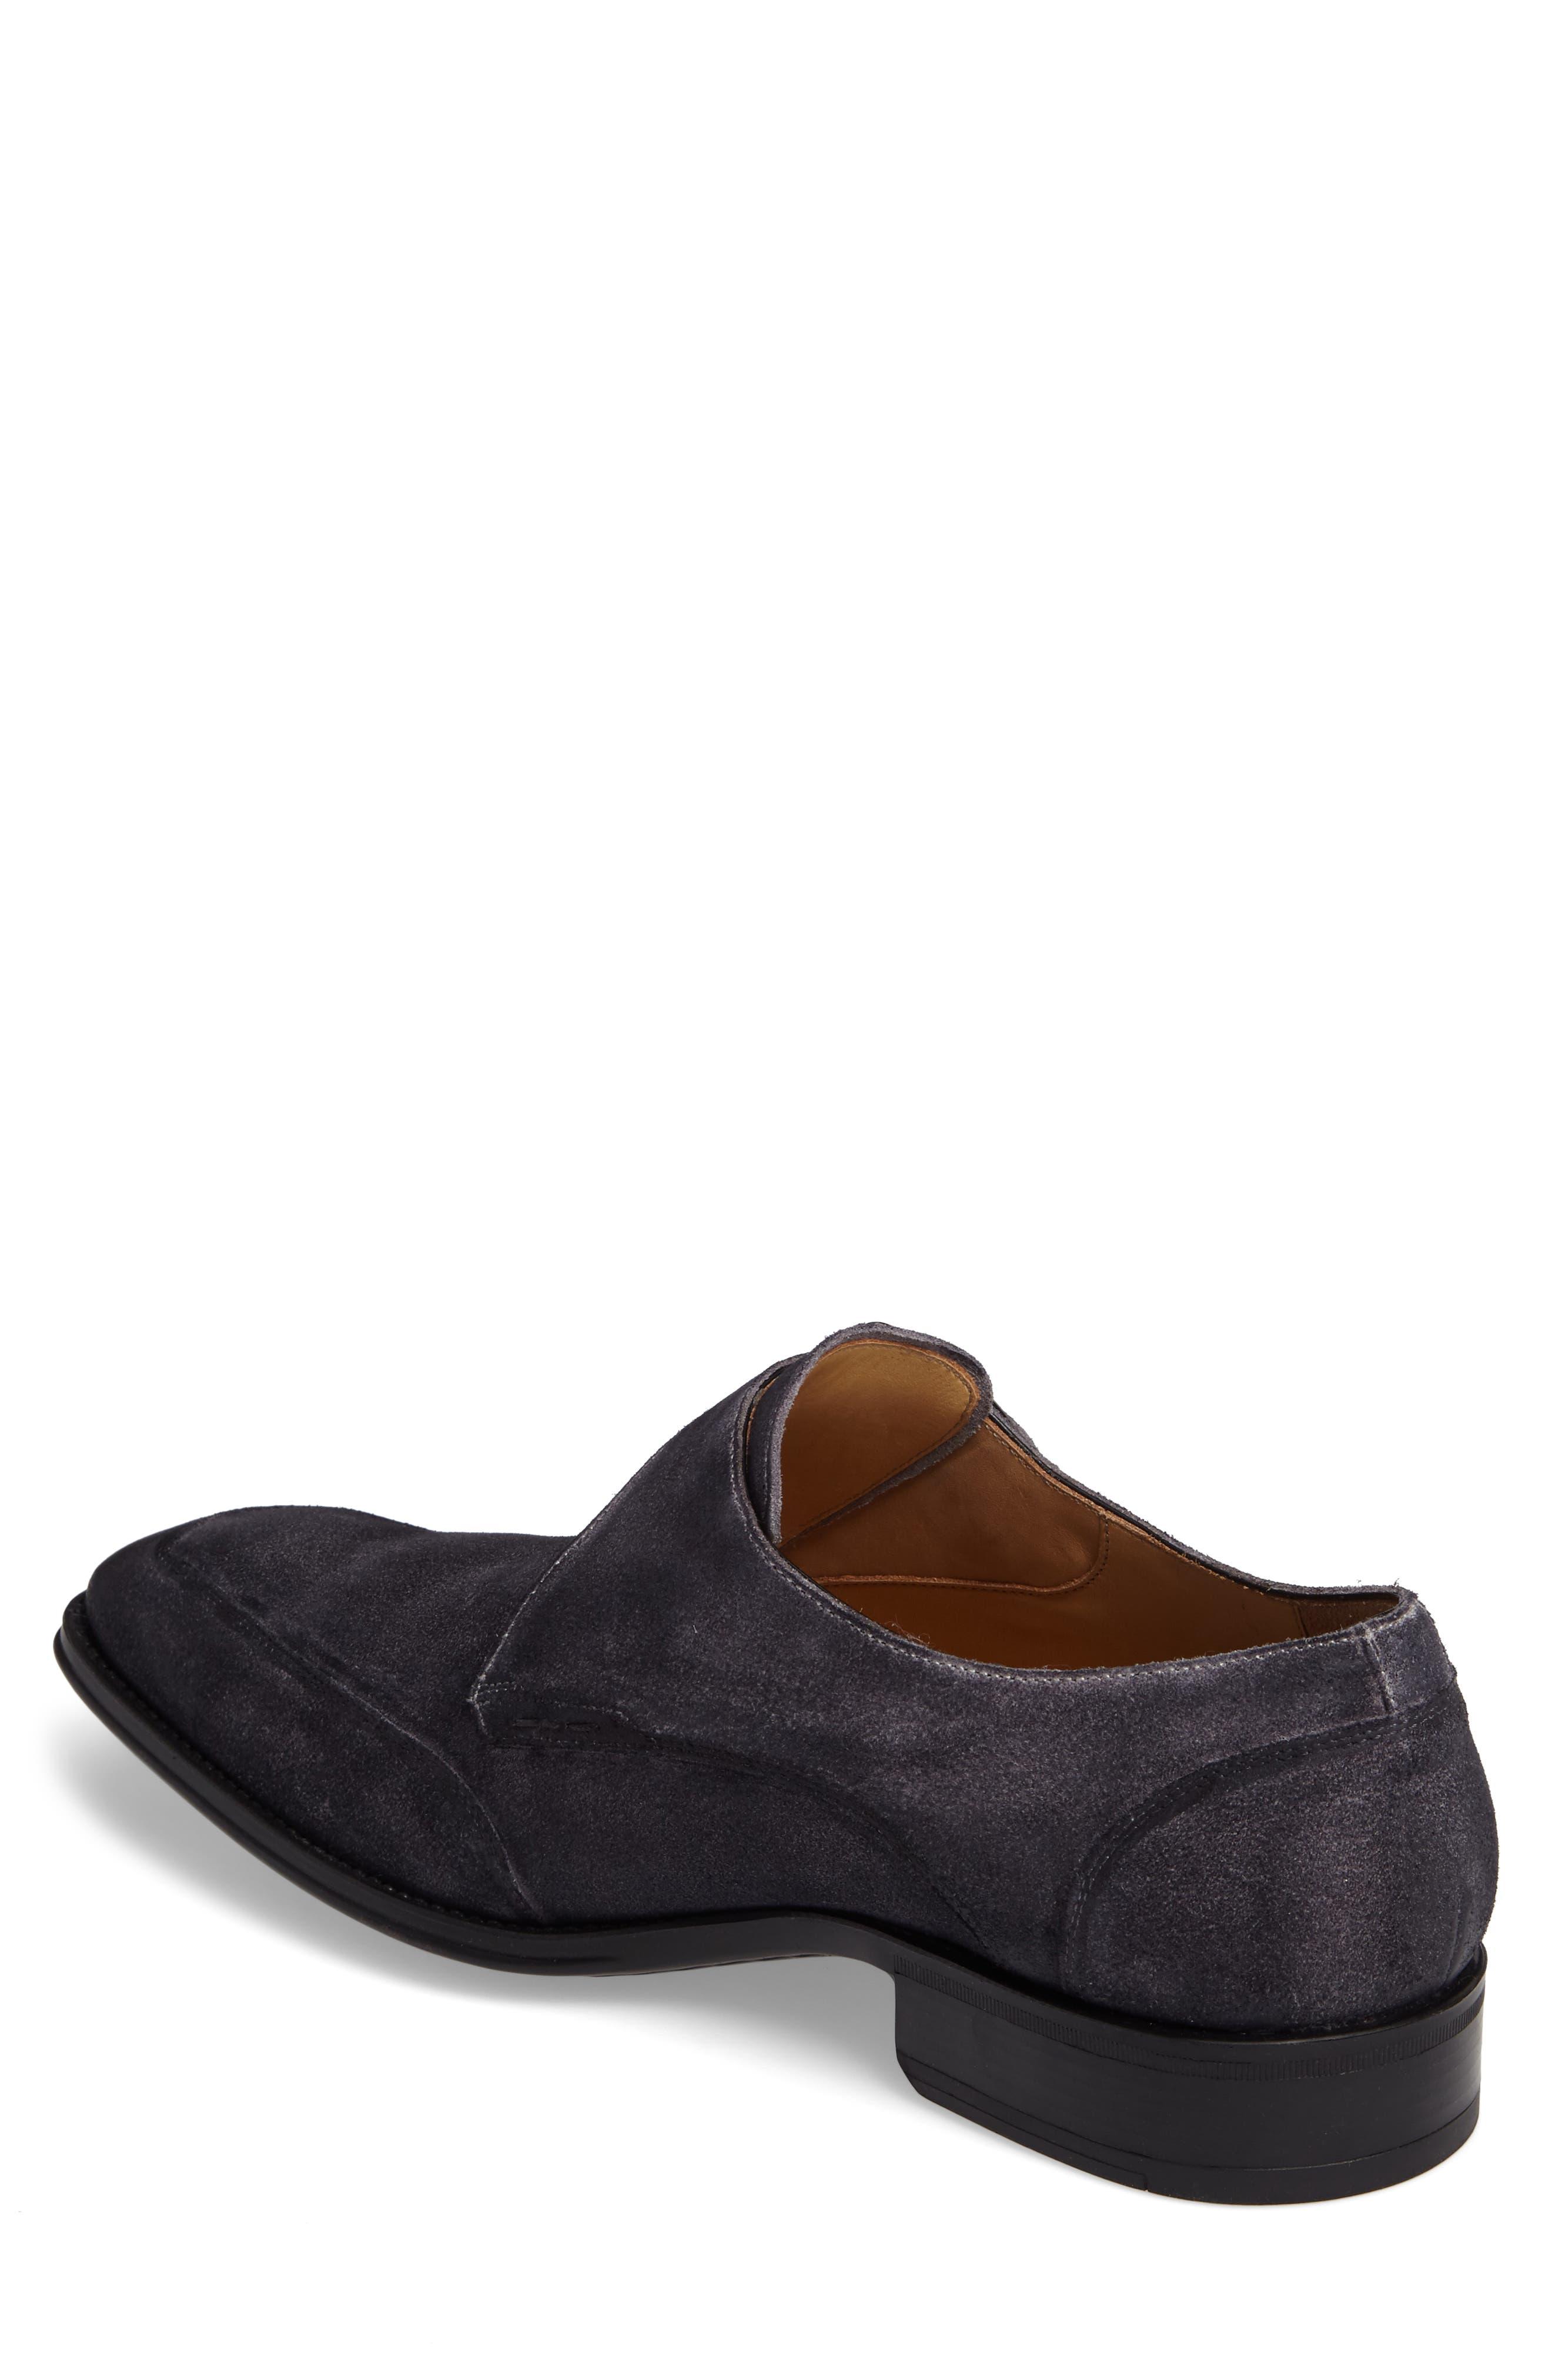 Alternate Image 2  - Mezlan Baza Monk Strap Shoe (Men)